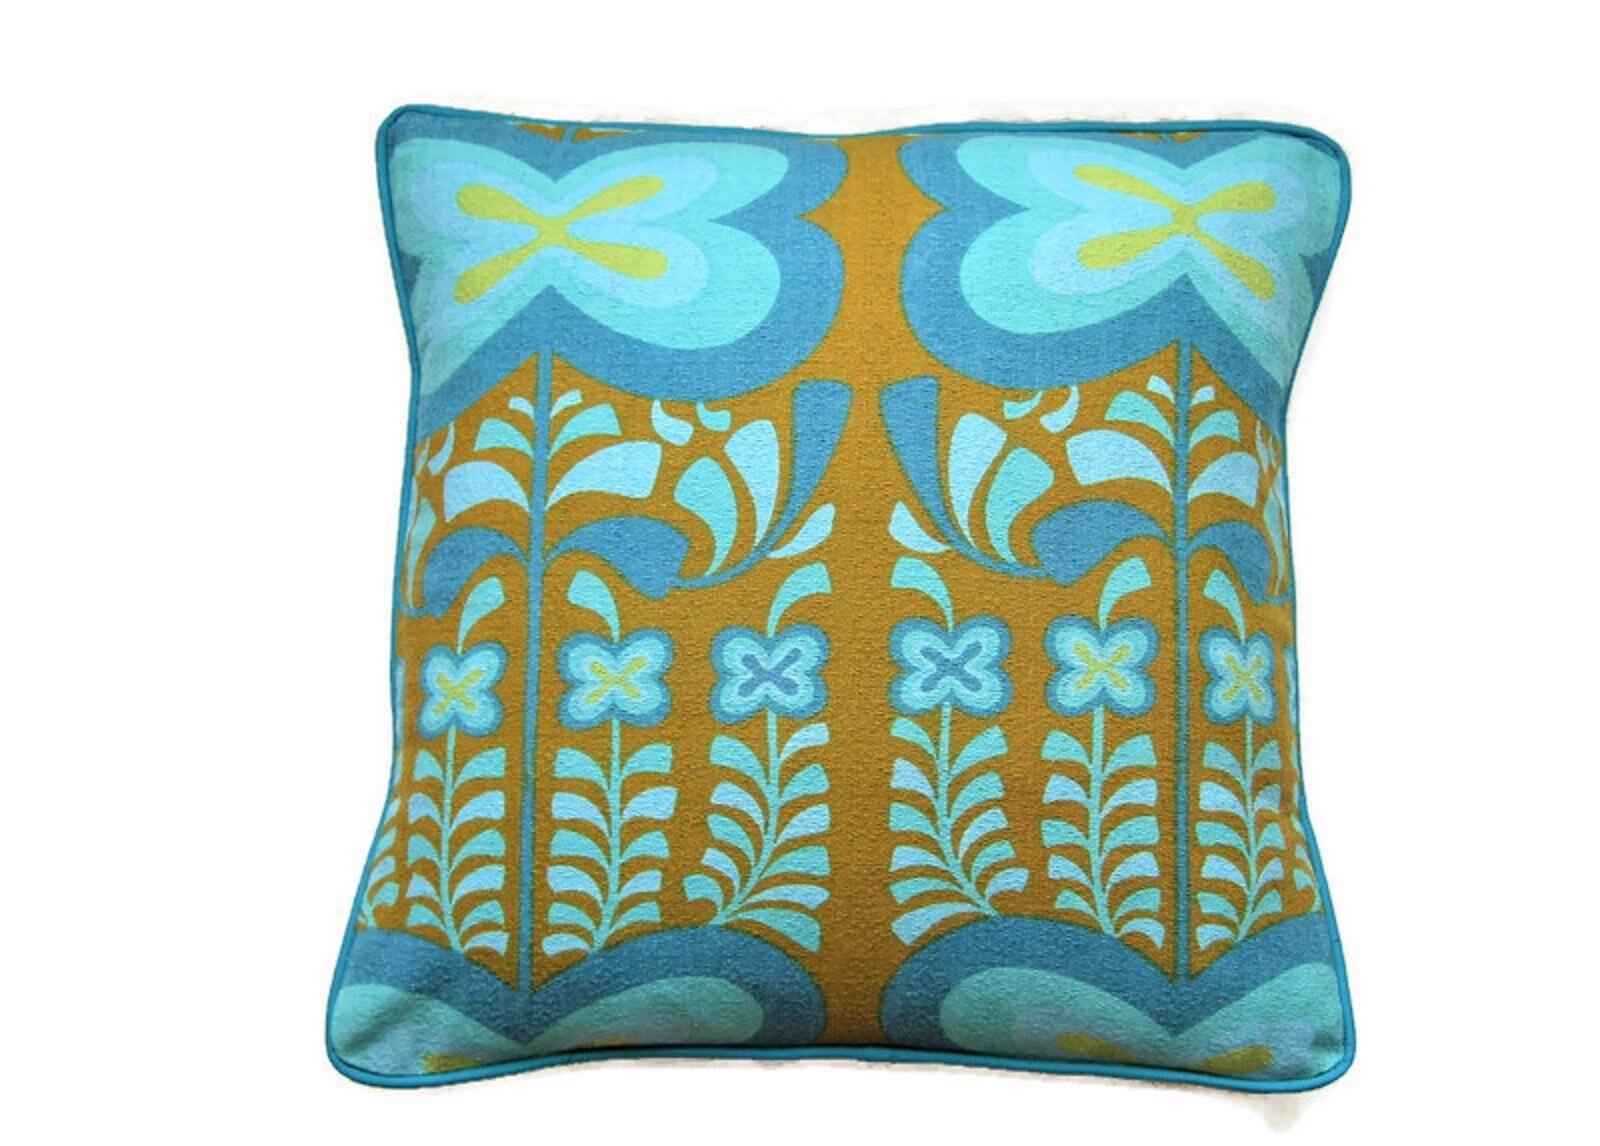 Heals Jyoti Bhomik Indian Summer, blue and orange 21s cotton barkcloth,  cushion cover, throw pillowcover, homeware decor.